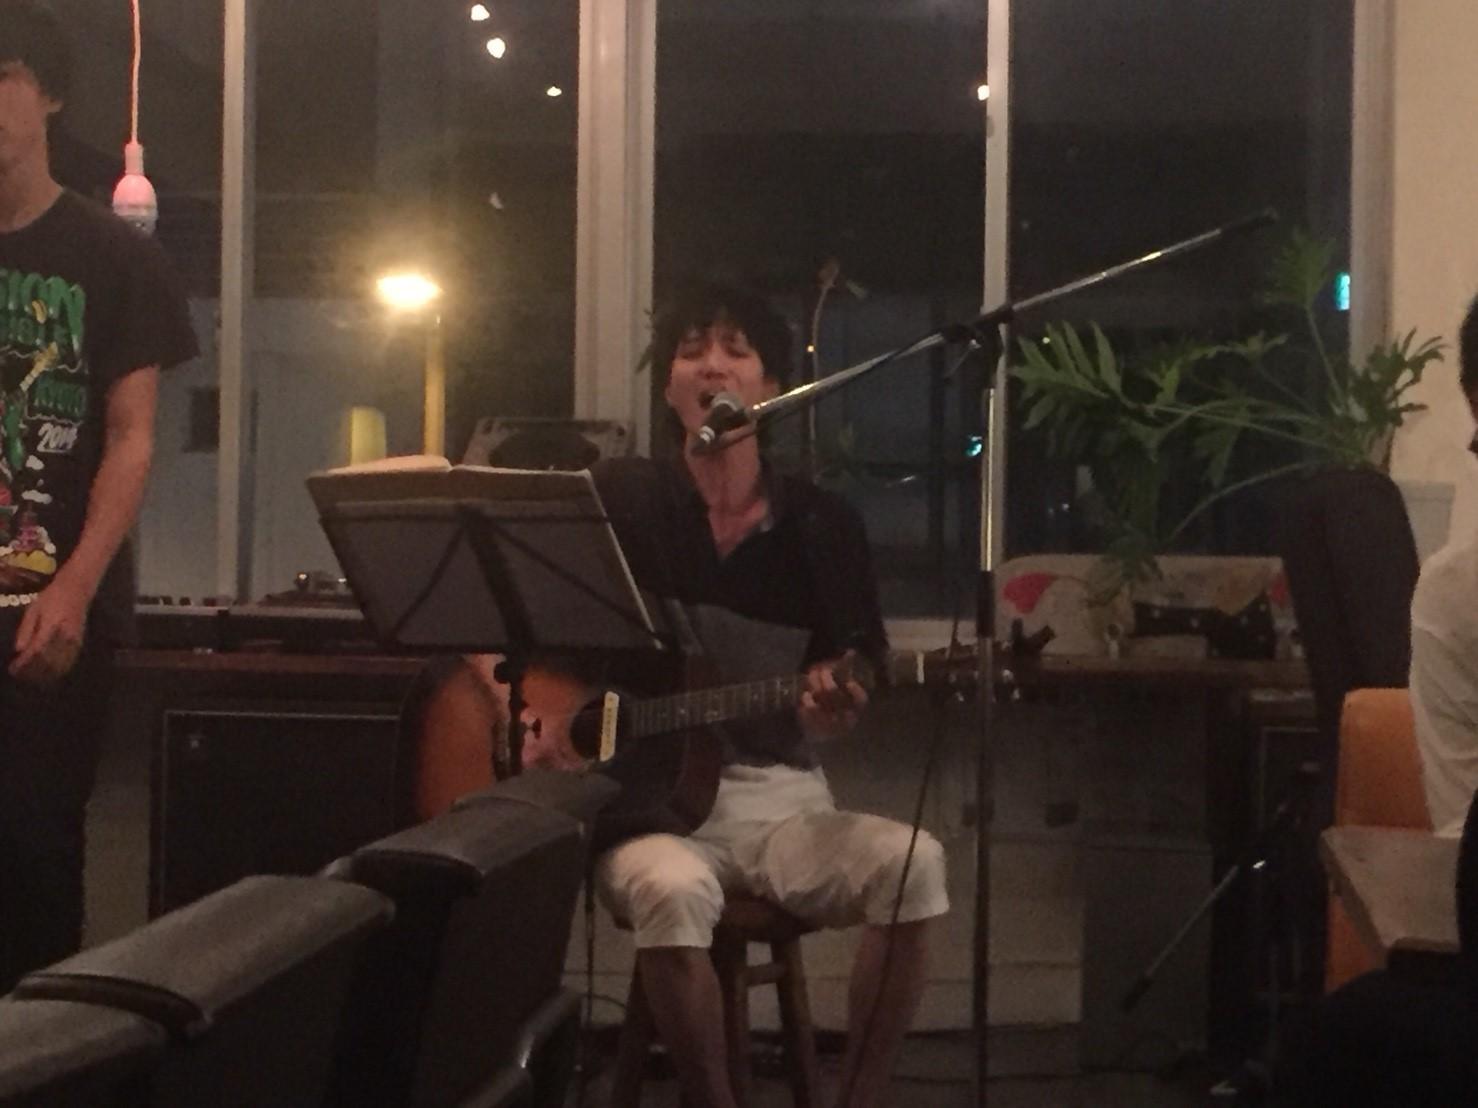 Luz × 鳥取大学 ACOUSTIC LIVE @Luzcafe  レポ_e0115904_15241774.jpg